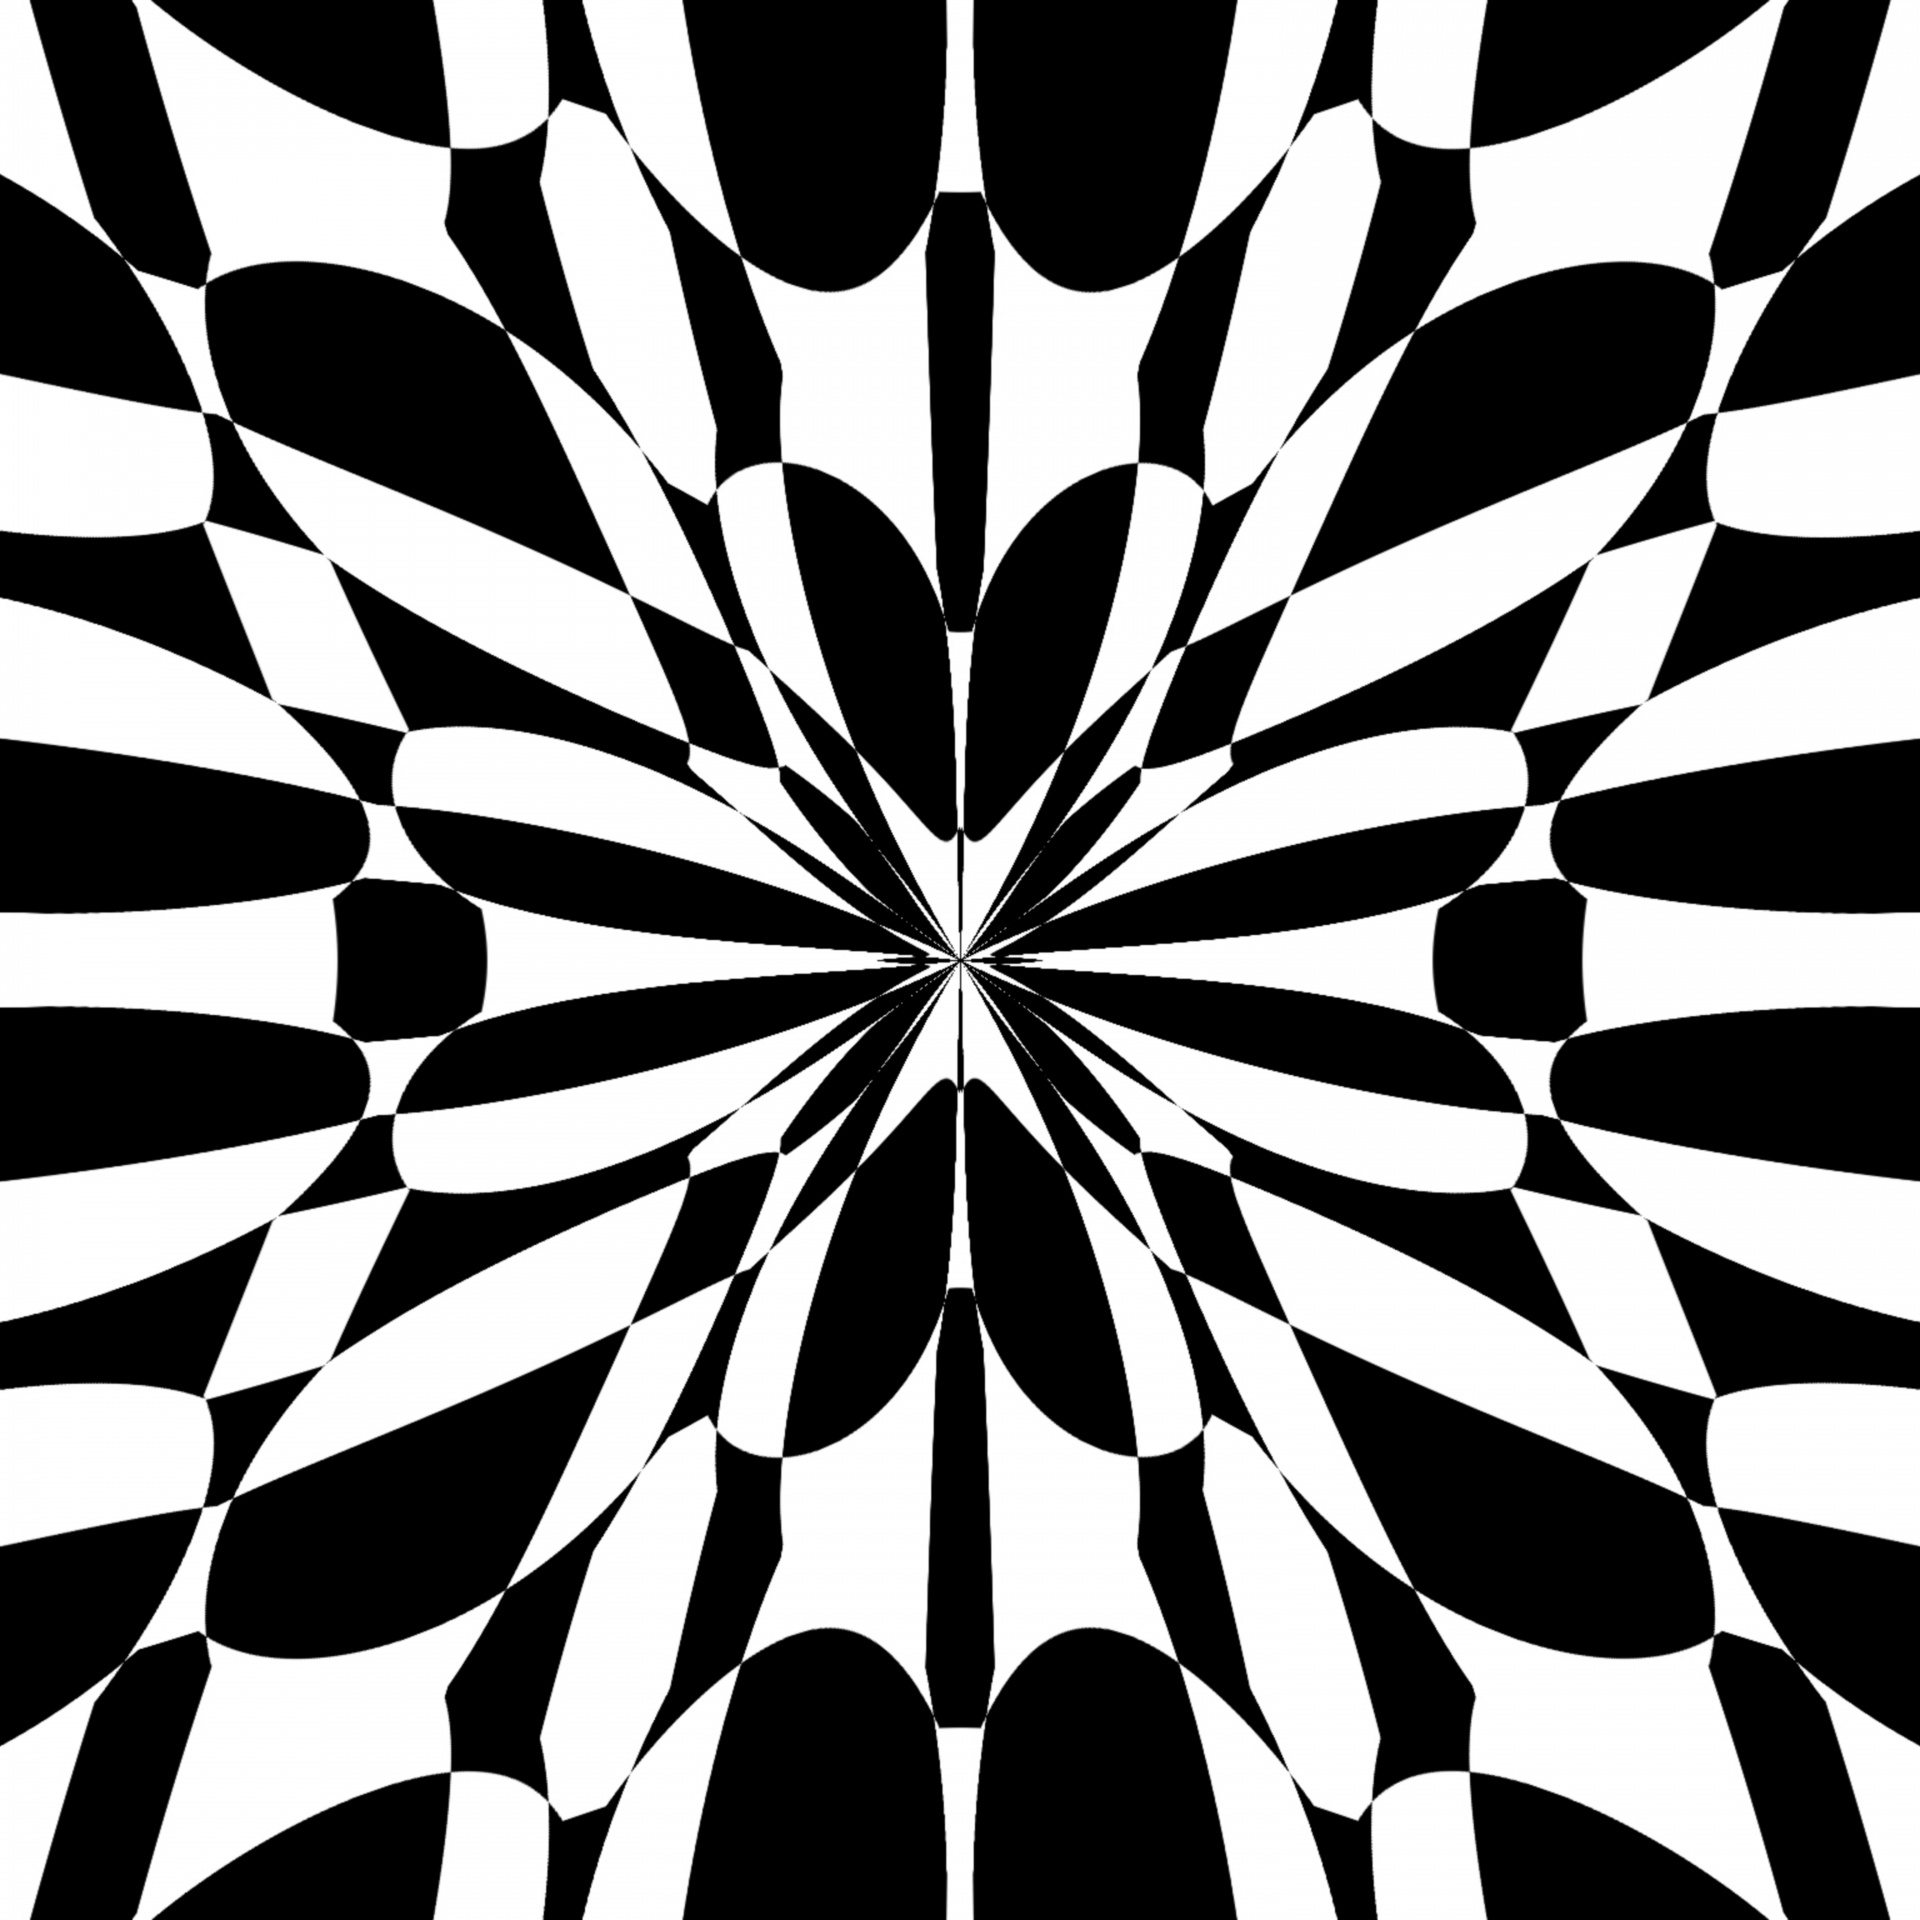 1920x1920 Mirror Checkerboard Free Stock Photo